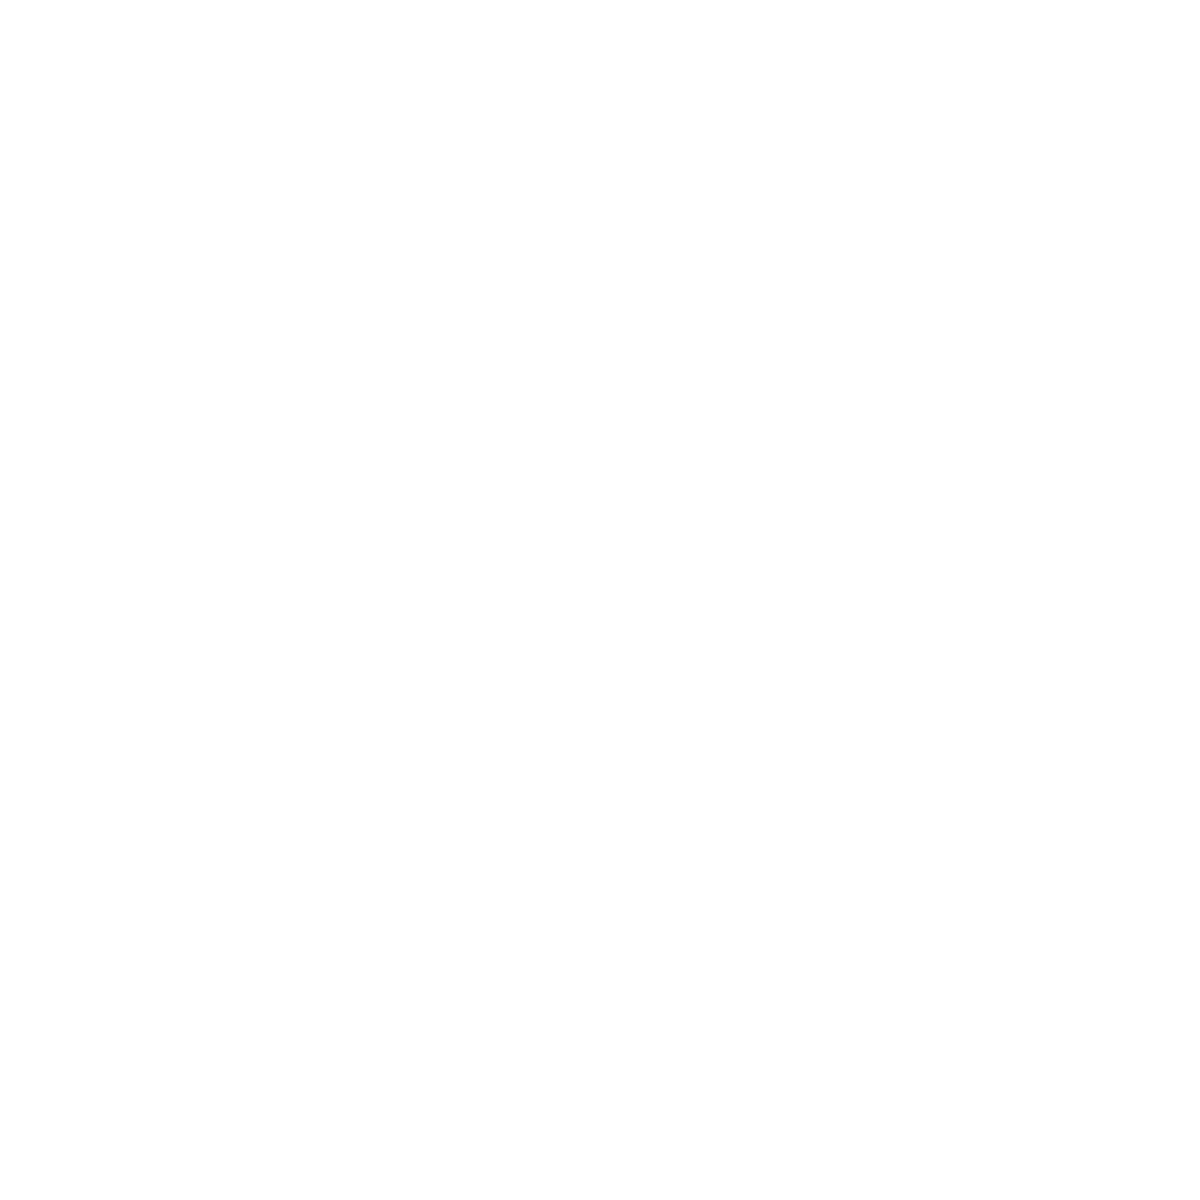 Date ariane windows 10 | Main page | coljuximi